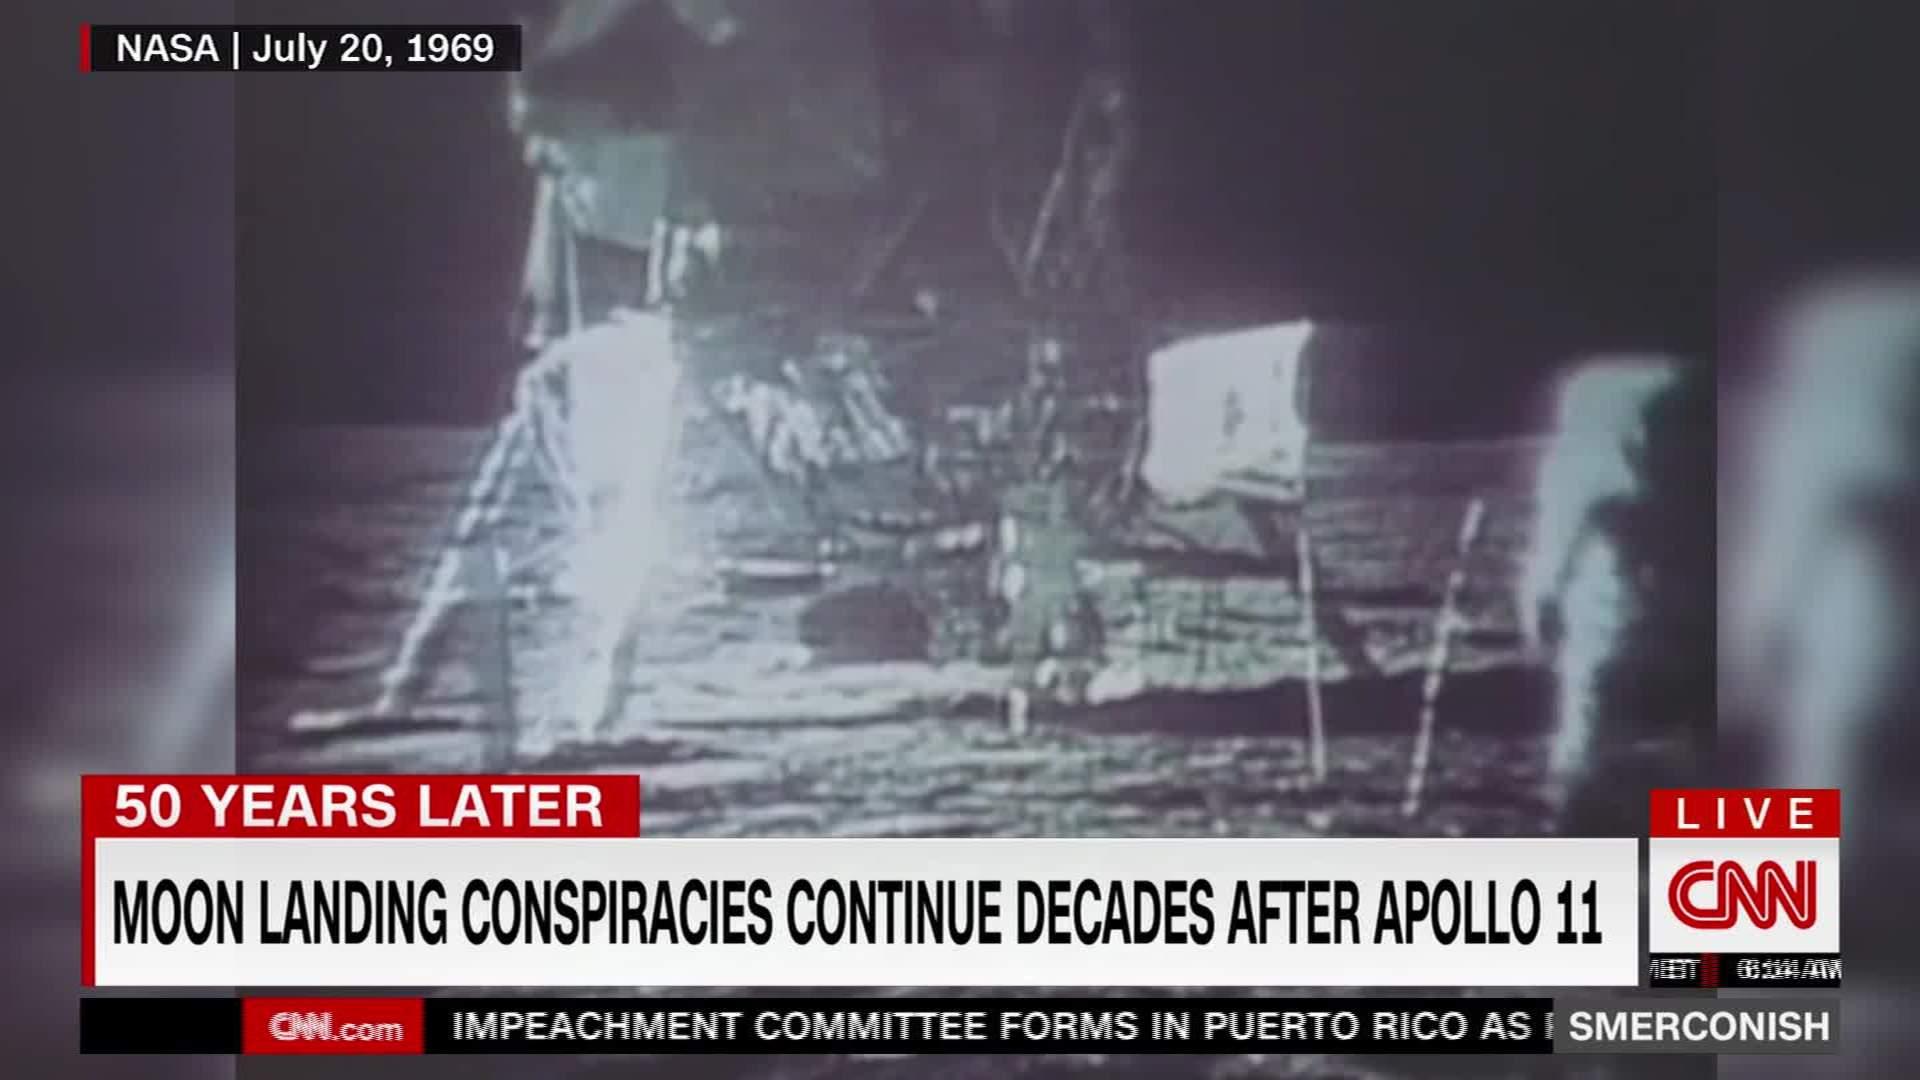 Fake moon landing The moonlanding